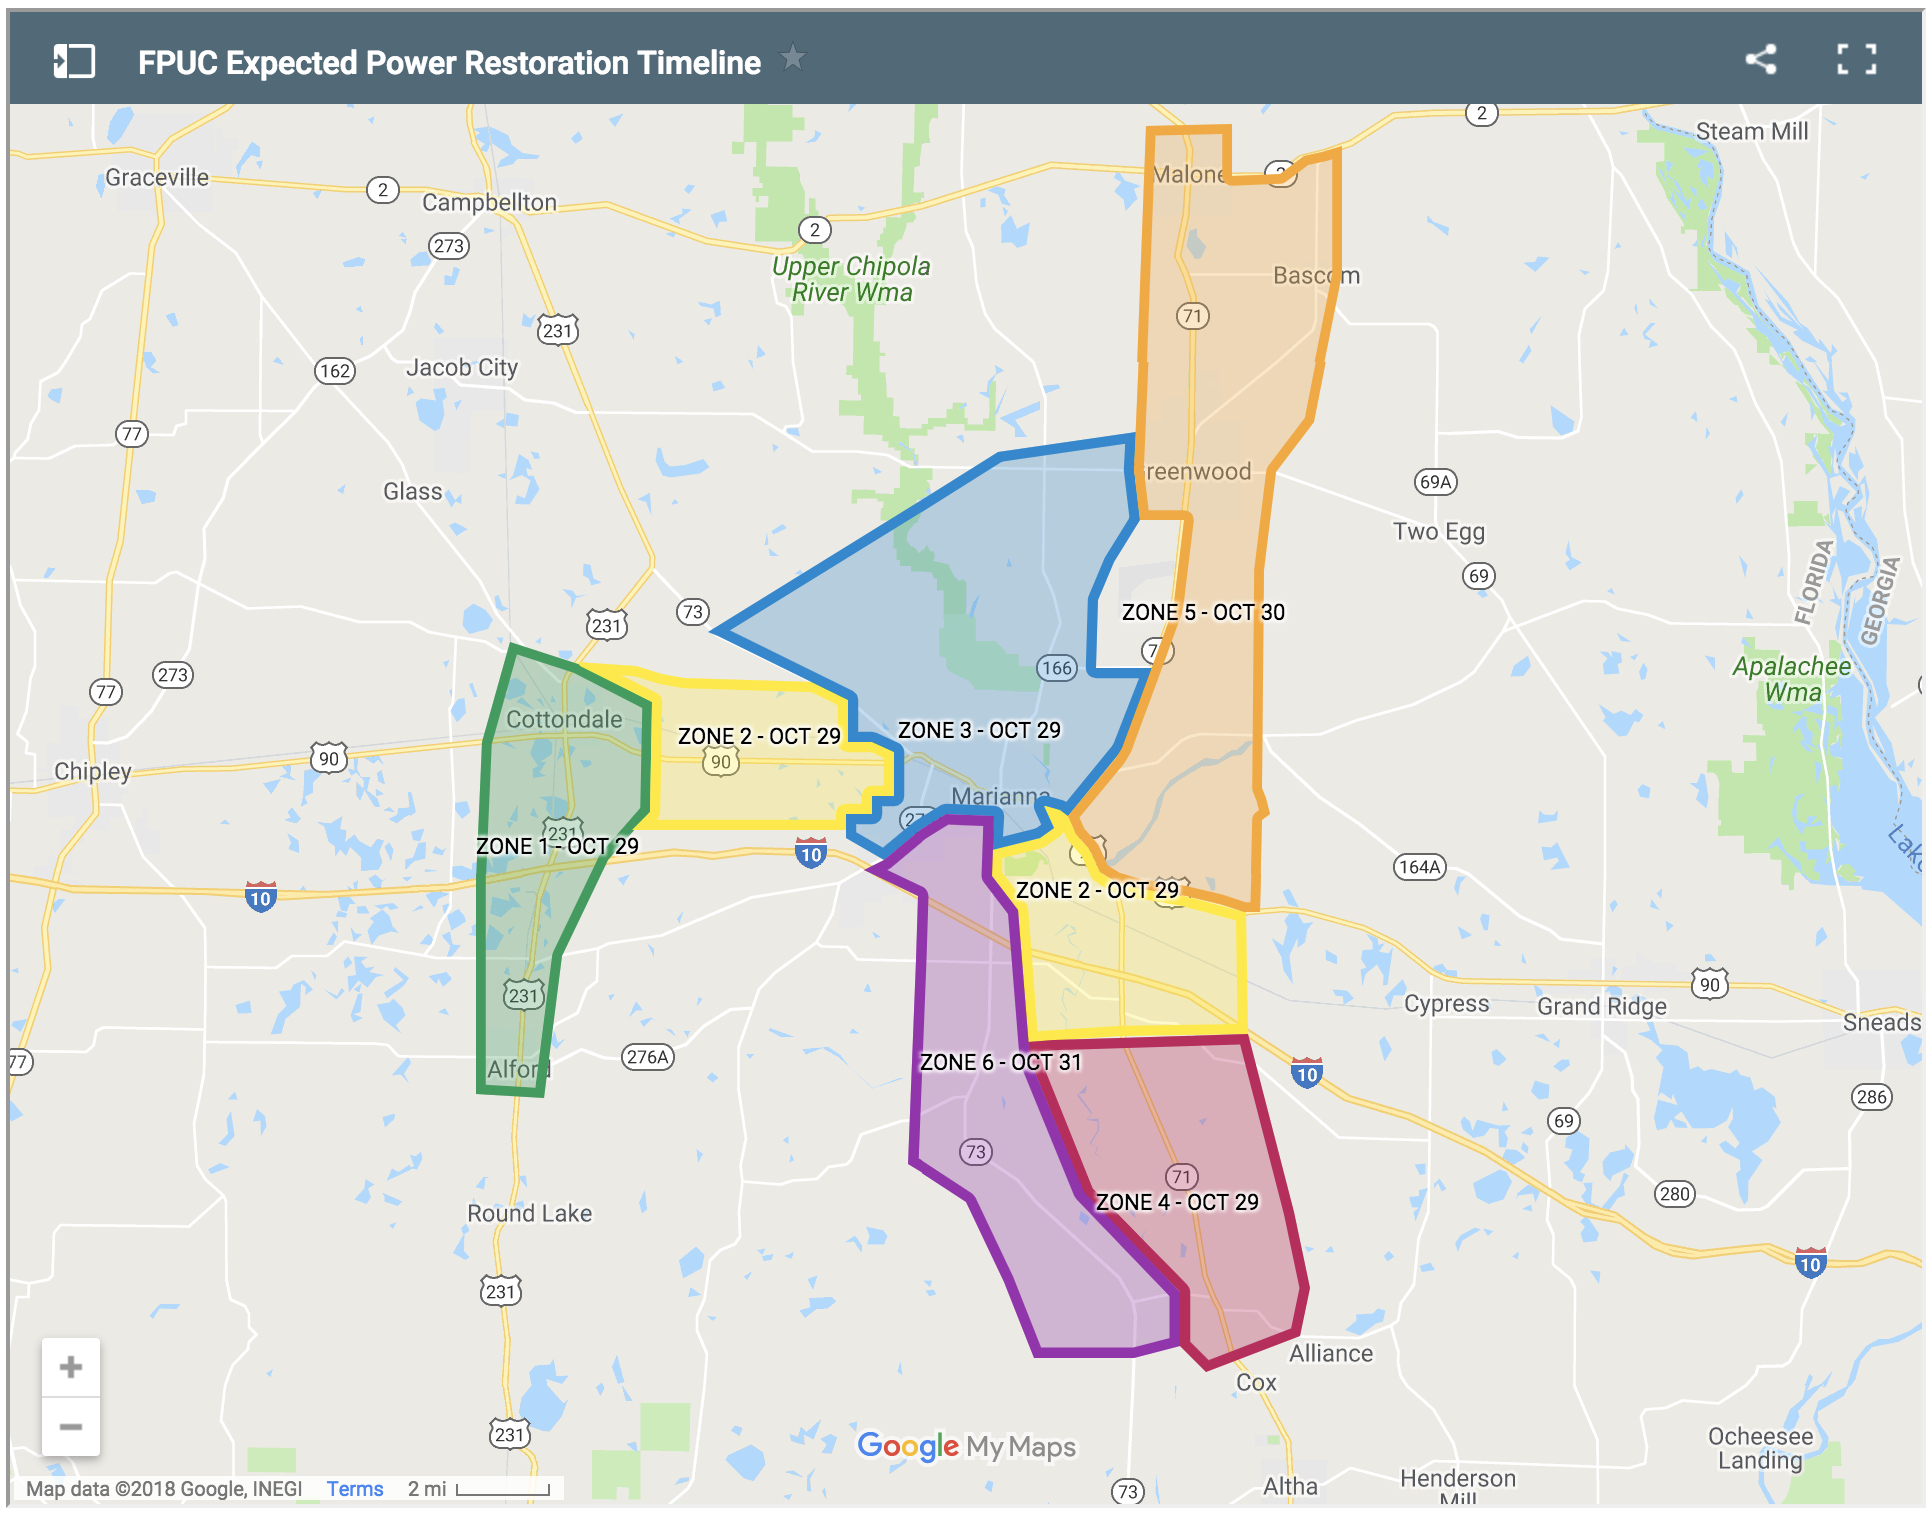 Fpu News | Hurricane Michael - Florida Public Utilities Power Outage Map